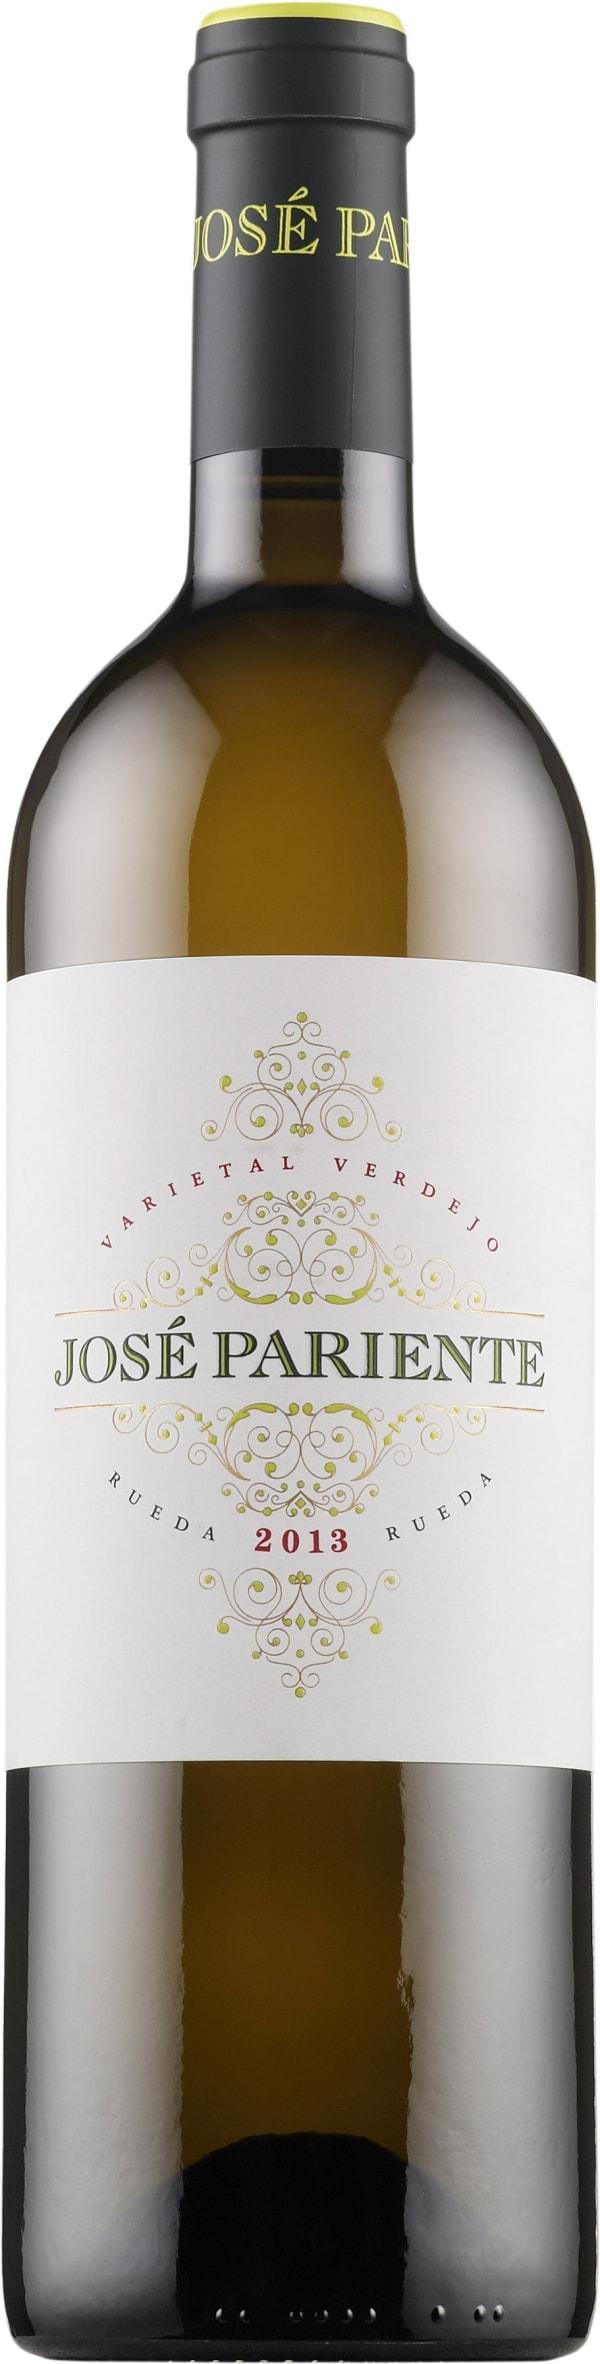 José Pariente Varietal Verdejo 2016